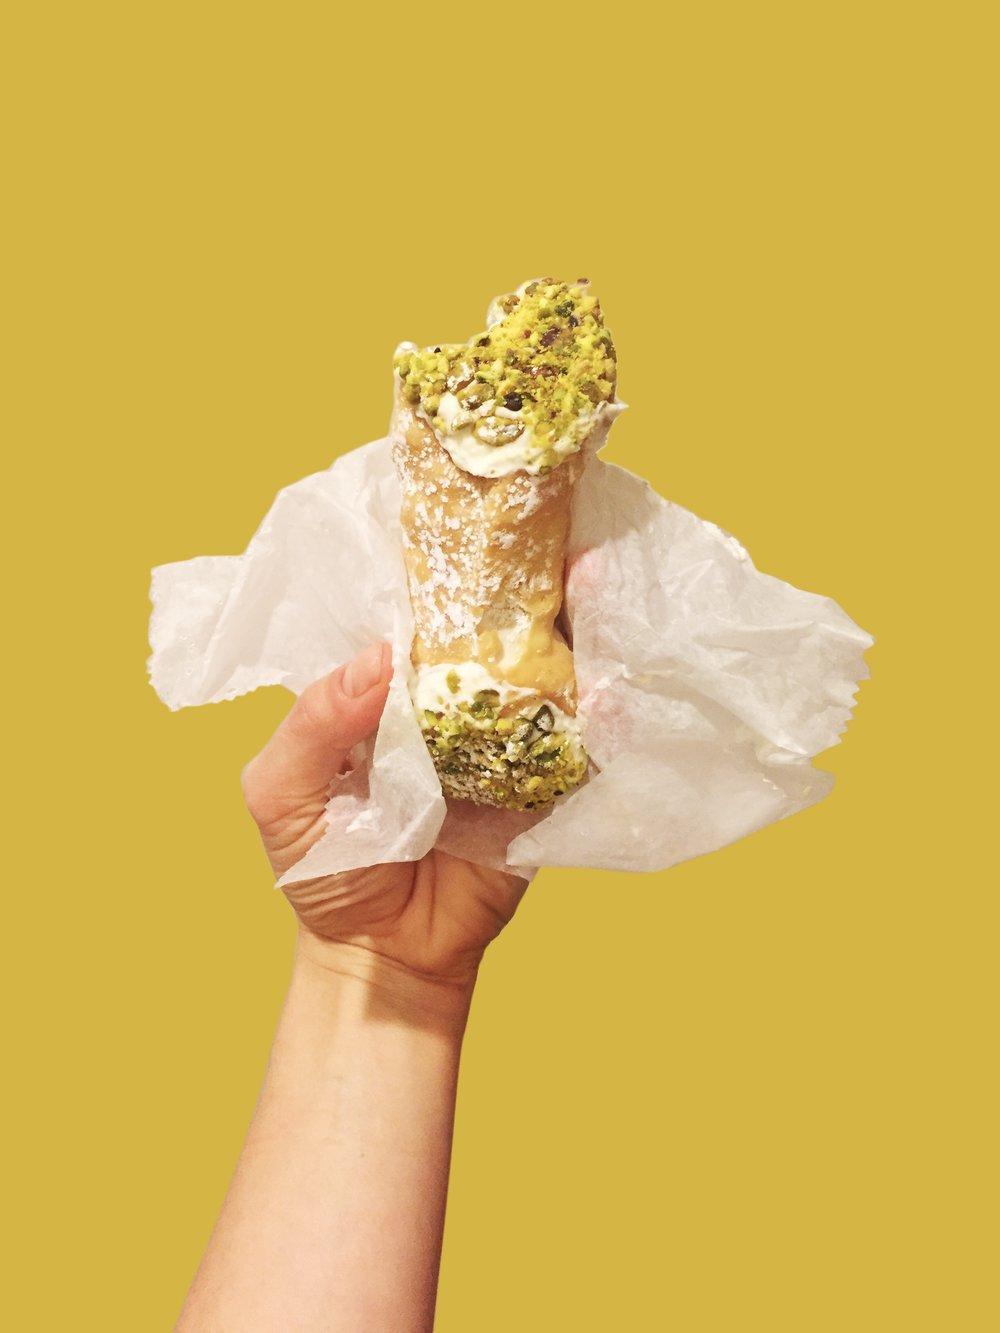 Mike's Pastry | Pistachio Cannoli